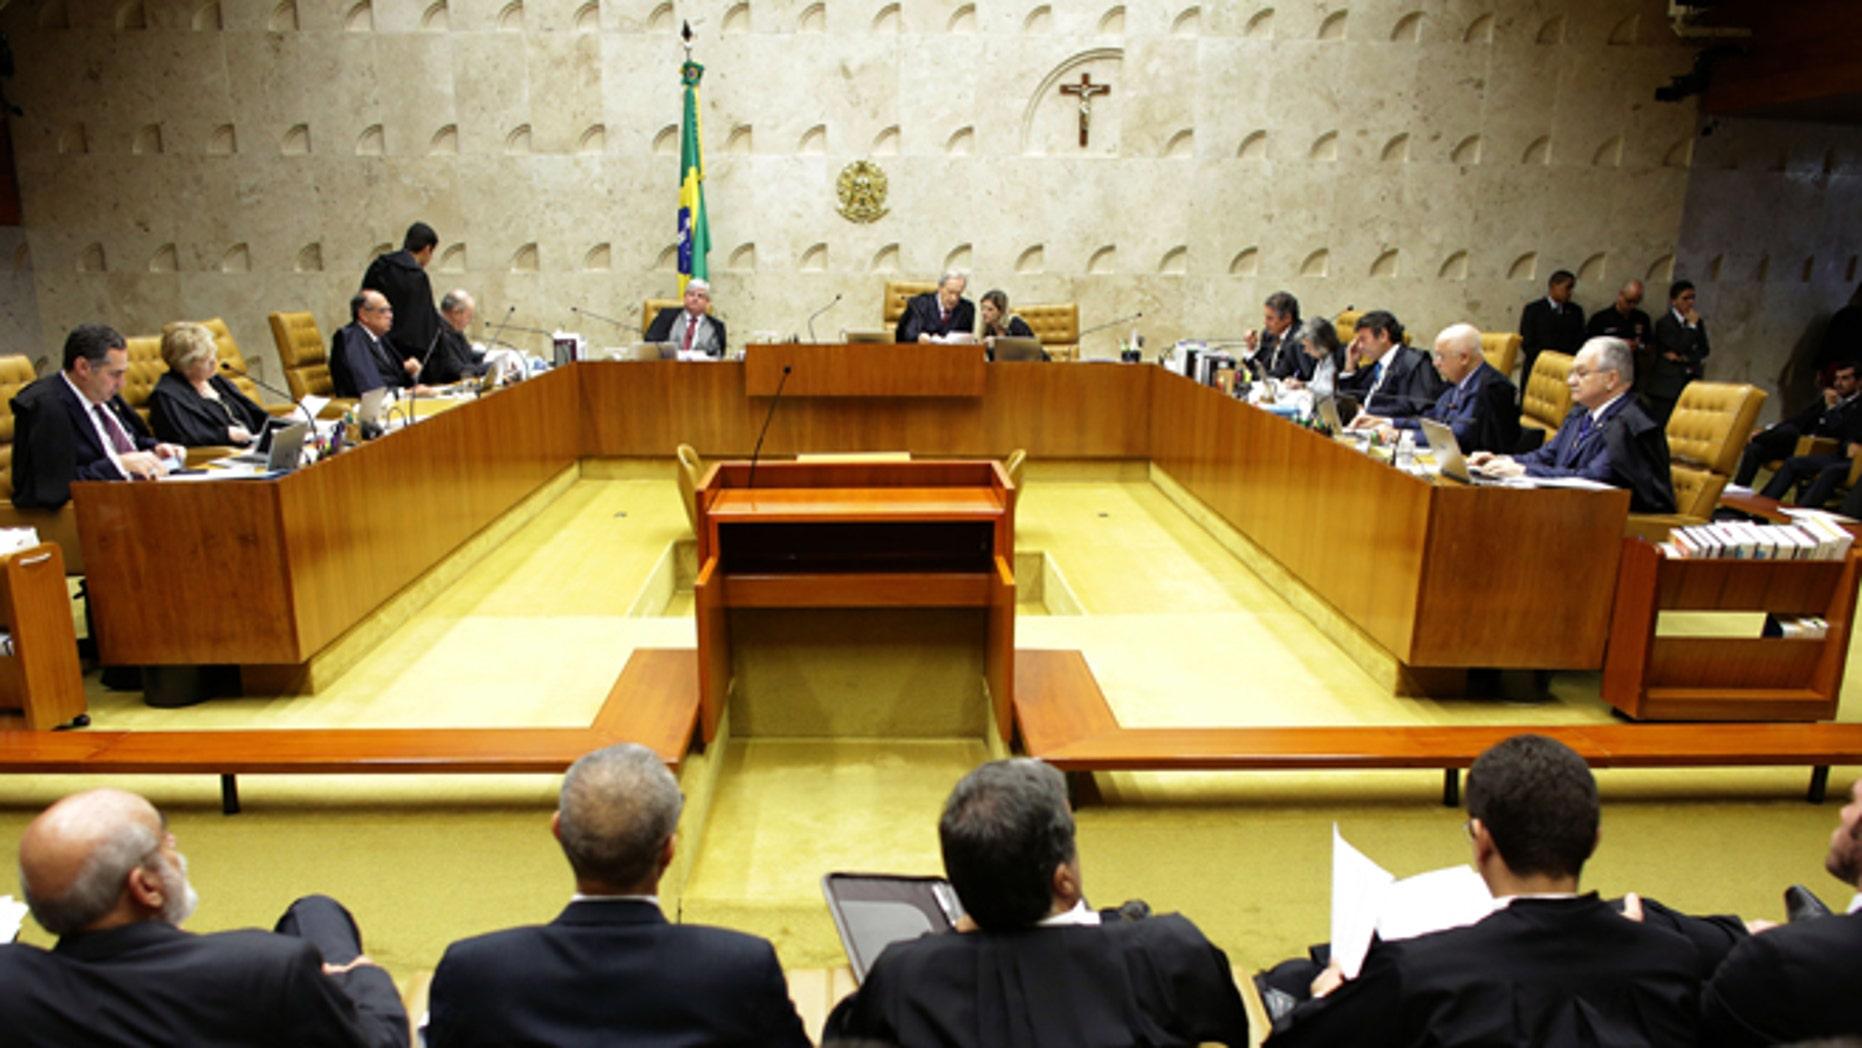 Brazil's Supreme Court holds session on the impeachment proceedings in Brasilia, Brazil, Thursday, April 14, 2016.